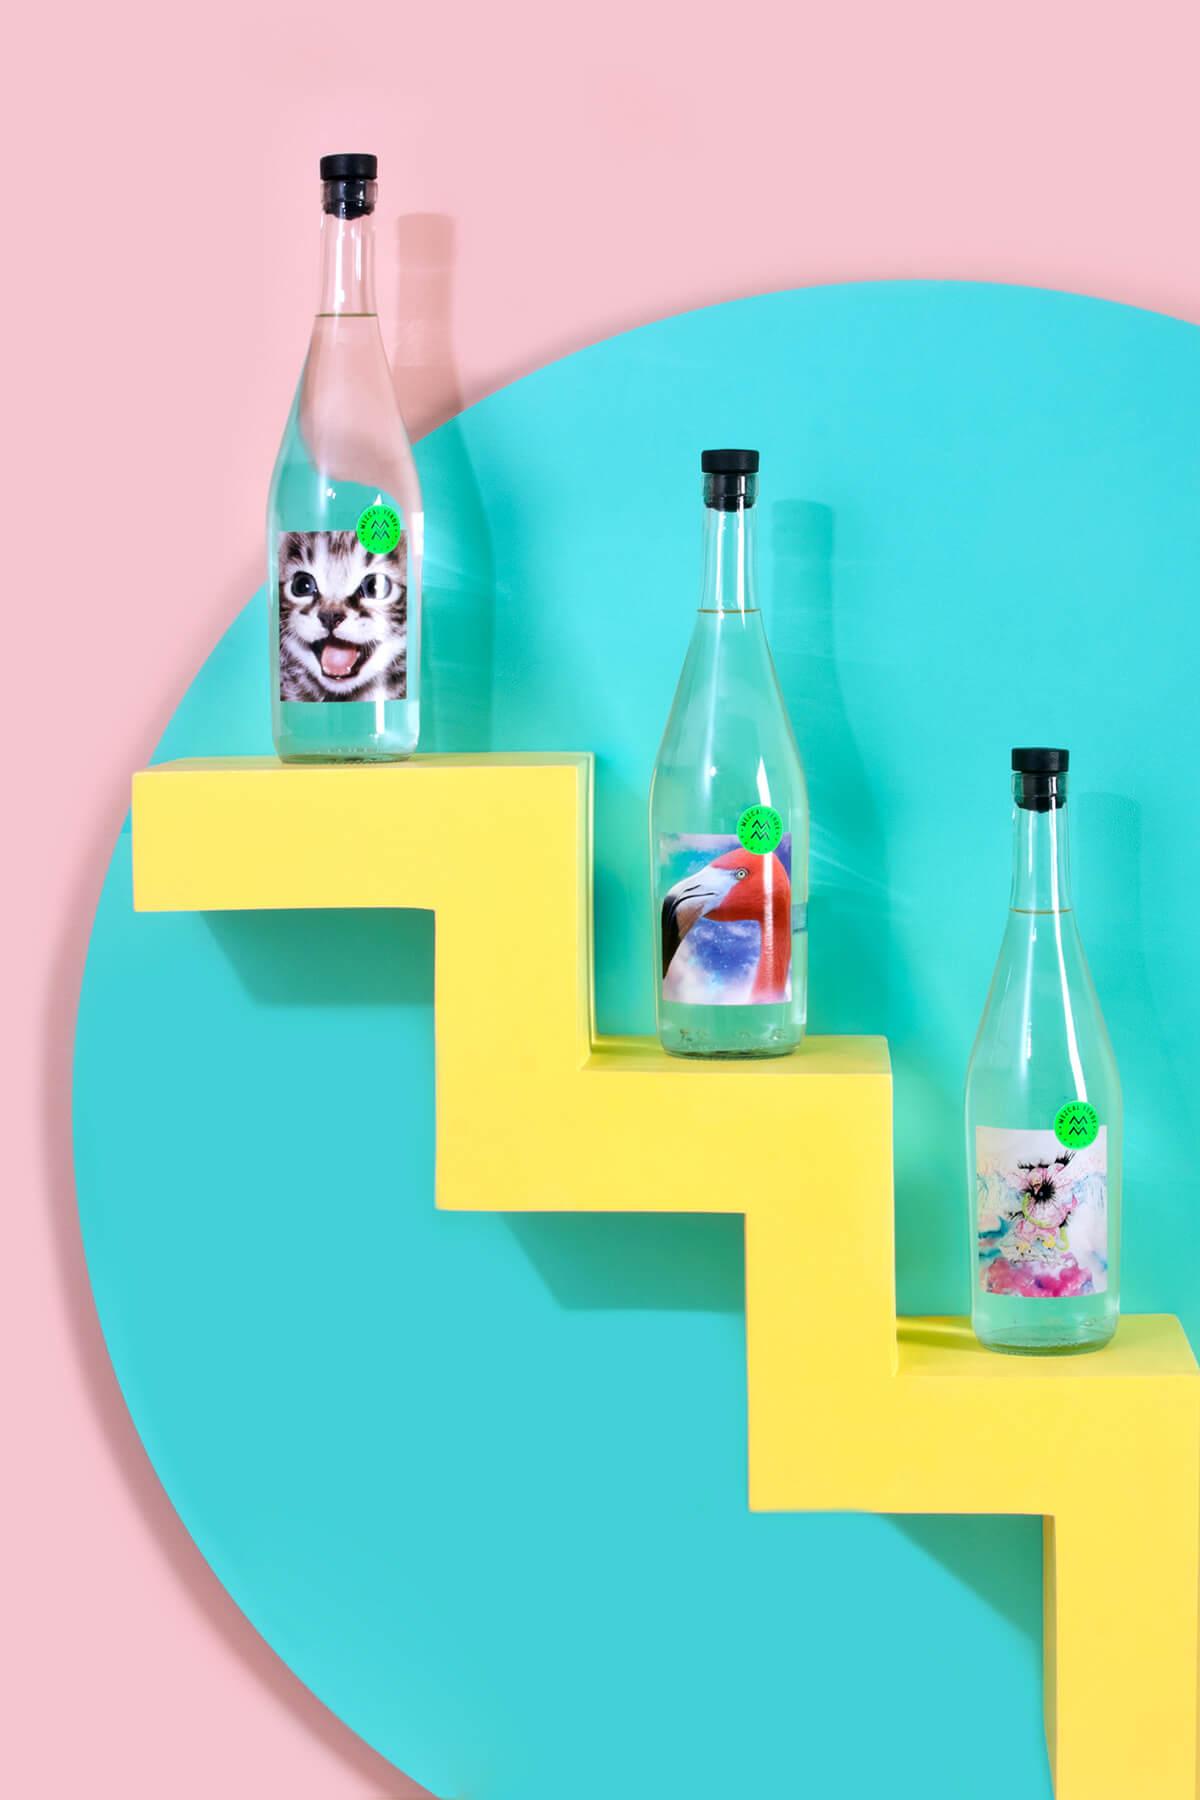 Botellas diseñadas por artistas